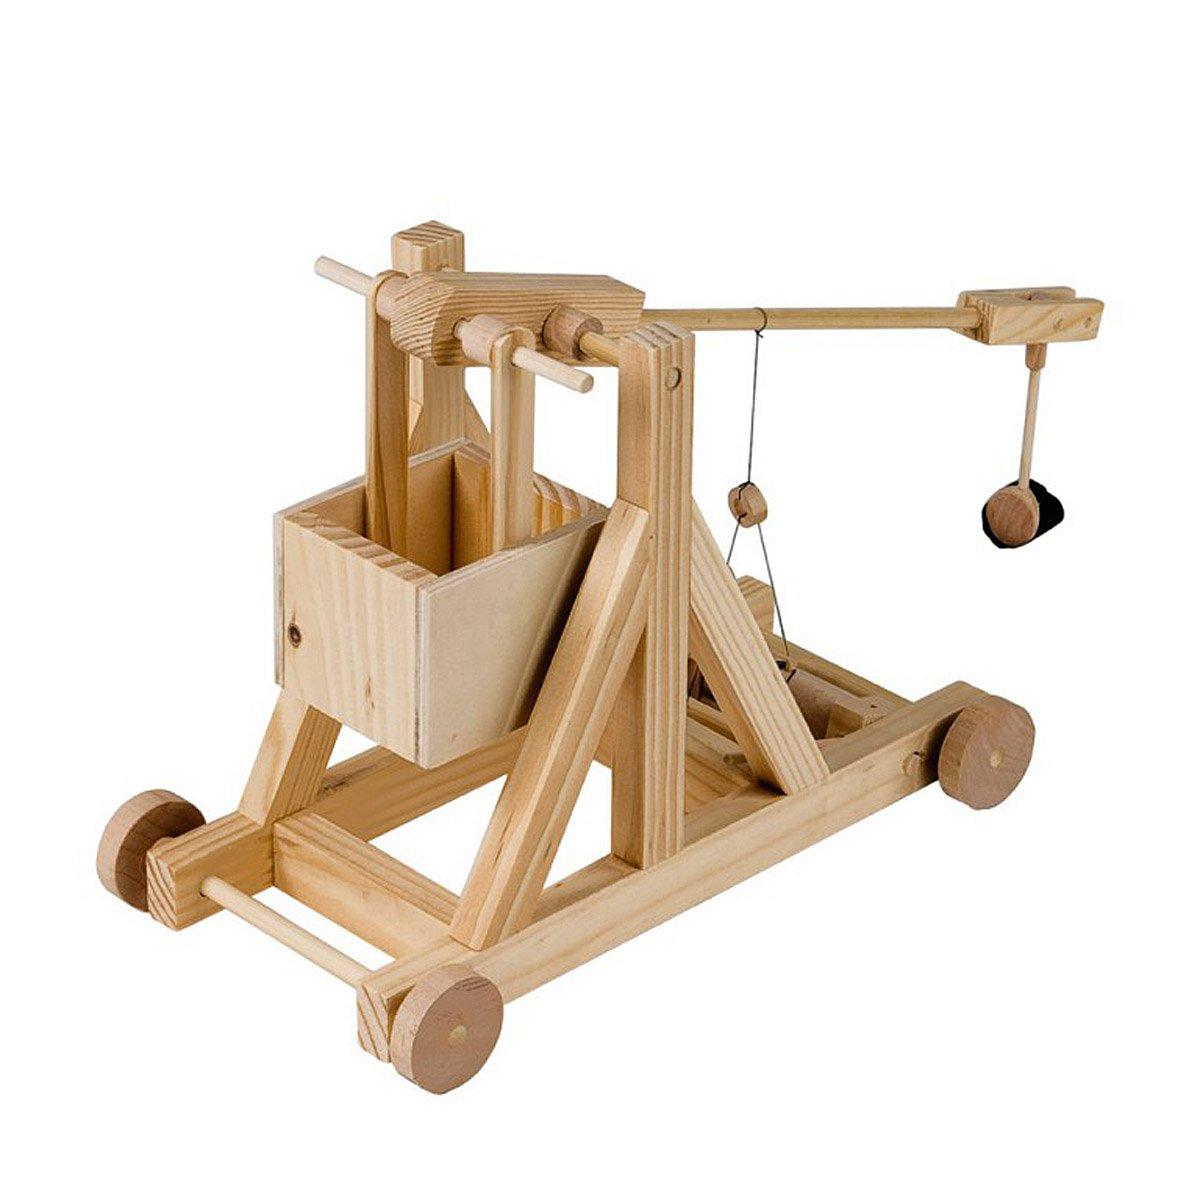 Timberkits - Trebuchet - Wooden Automata Kit TK022